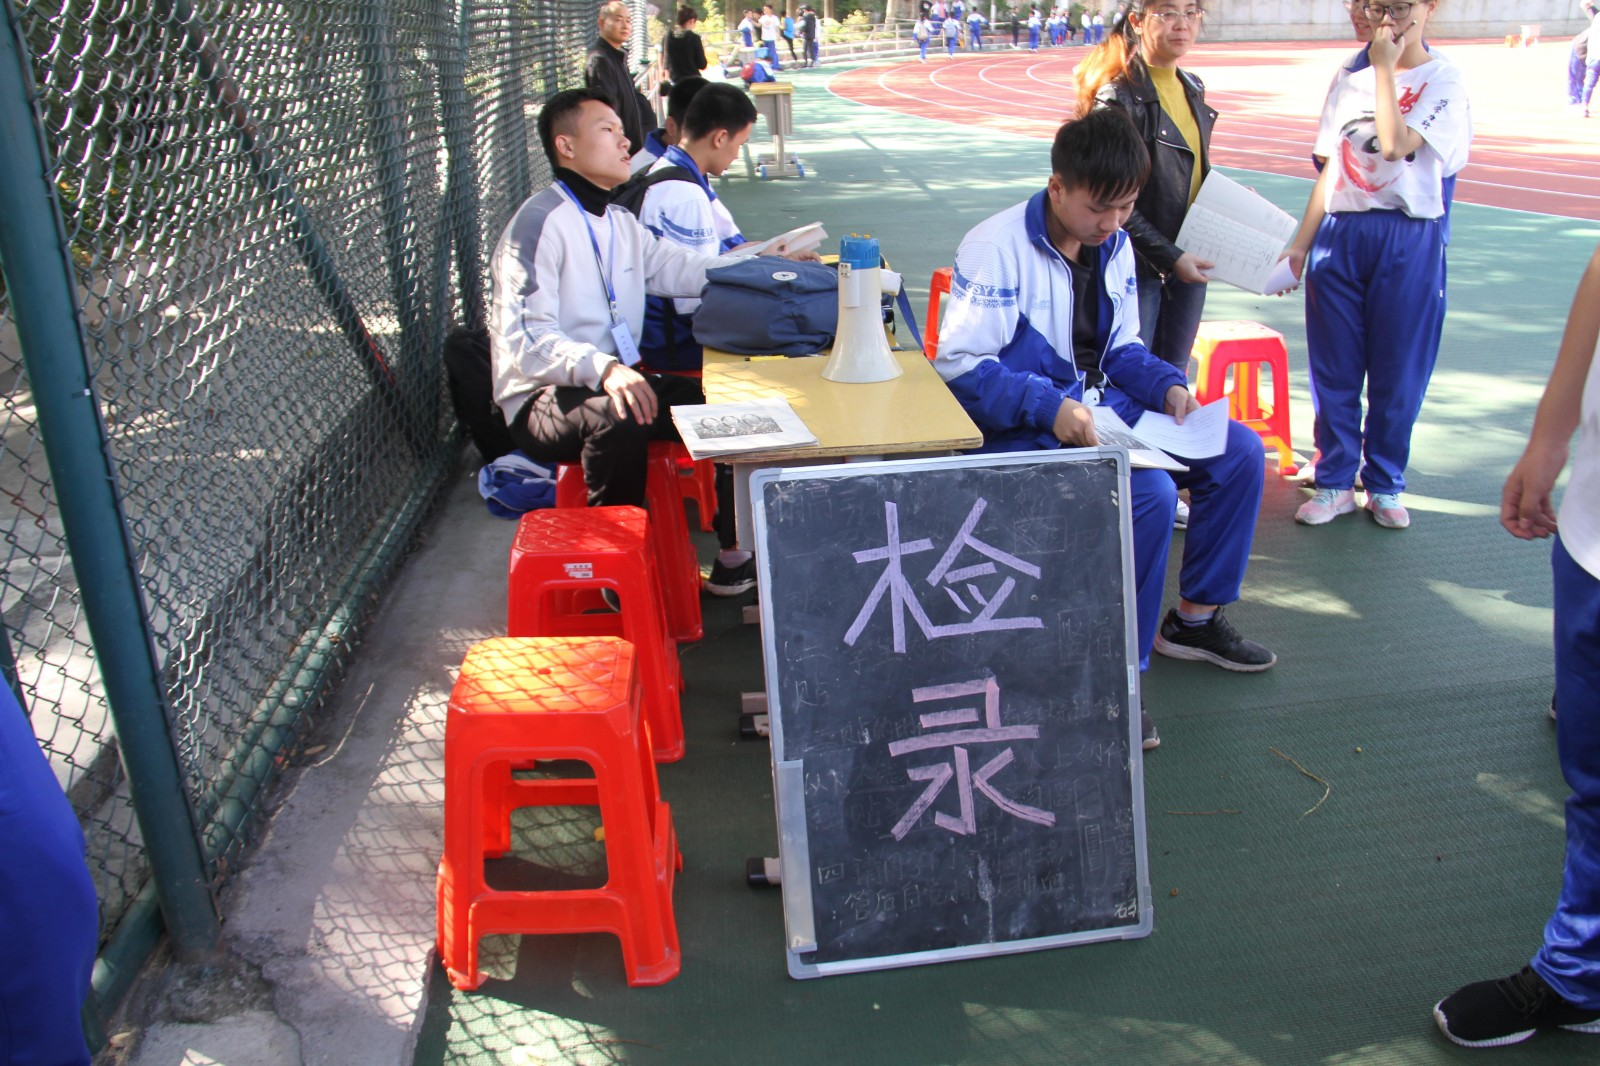 IMG_8507_爱奇艺.jpg